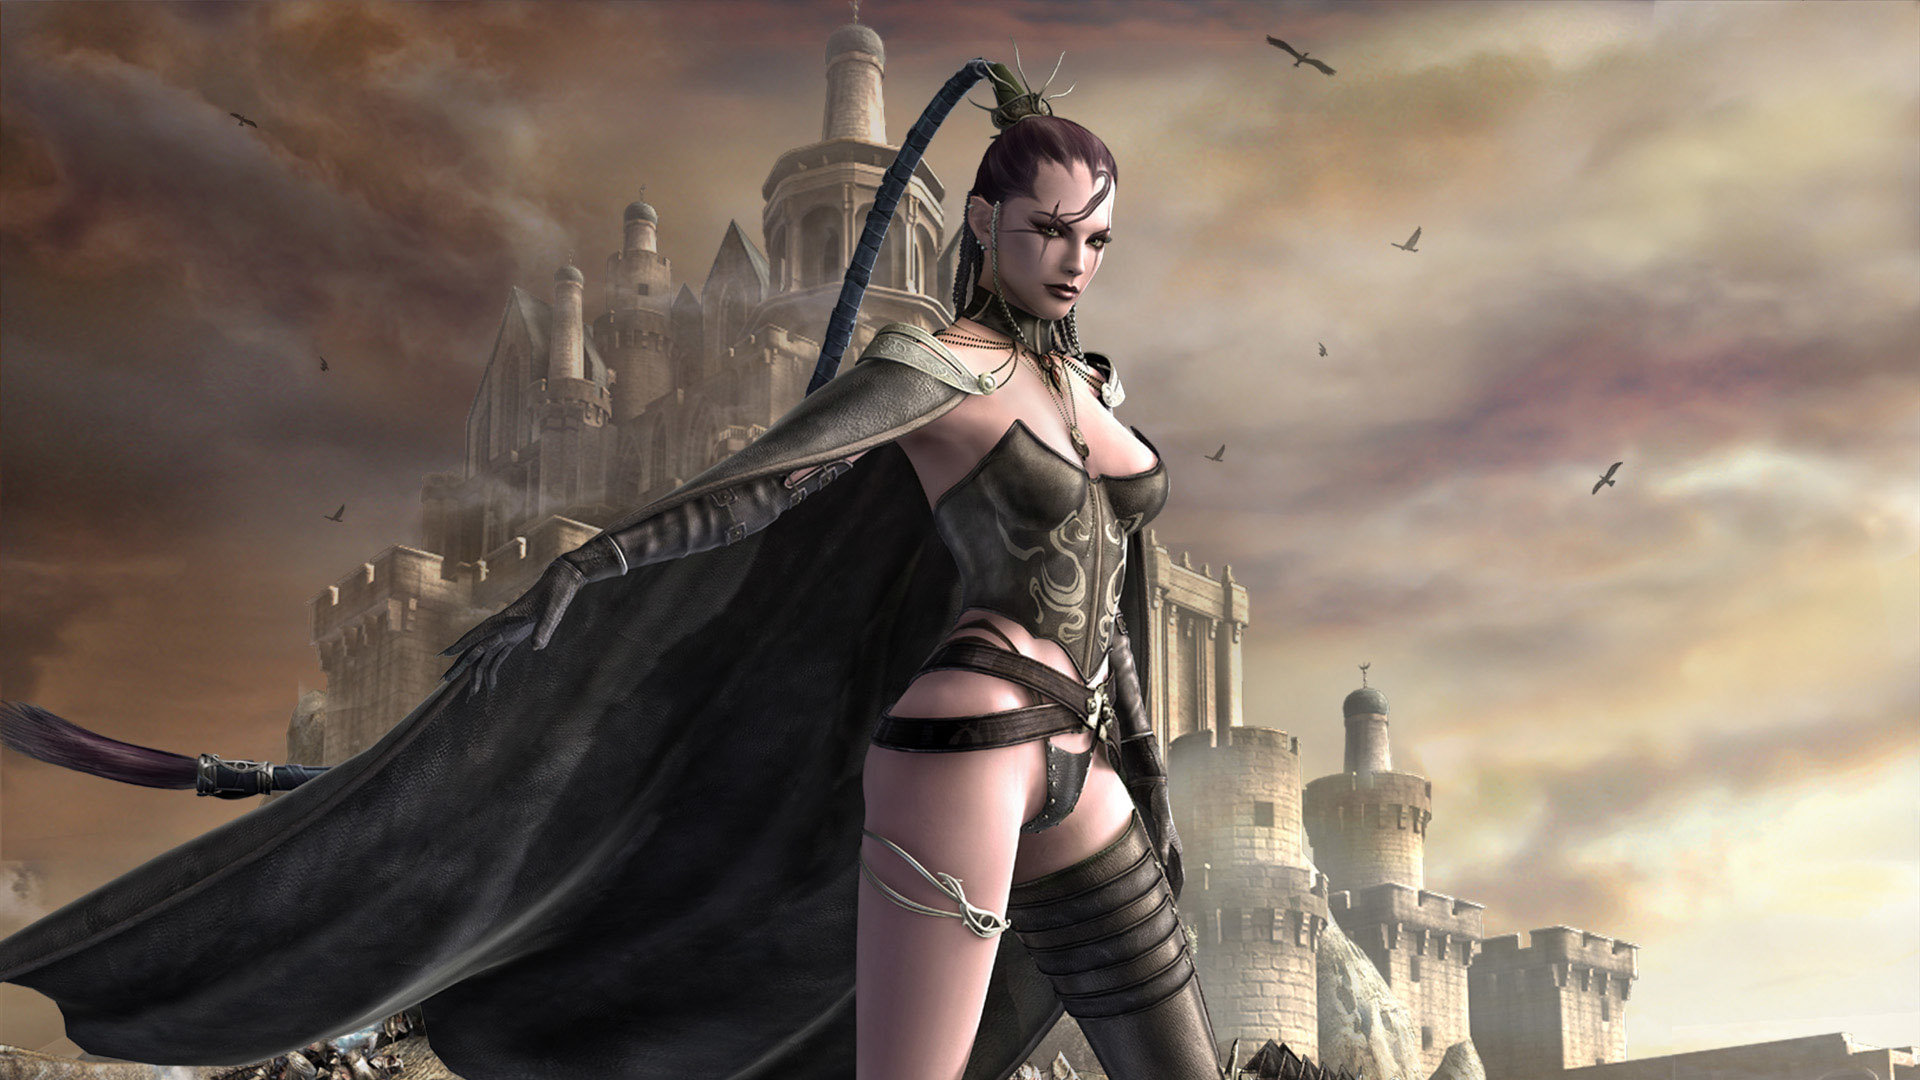 free download fantasy women wallpaper id:342527 full hd 1080p for